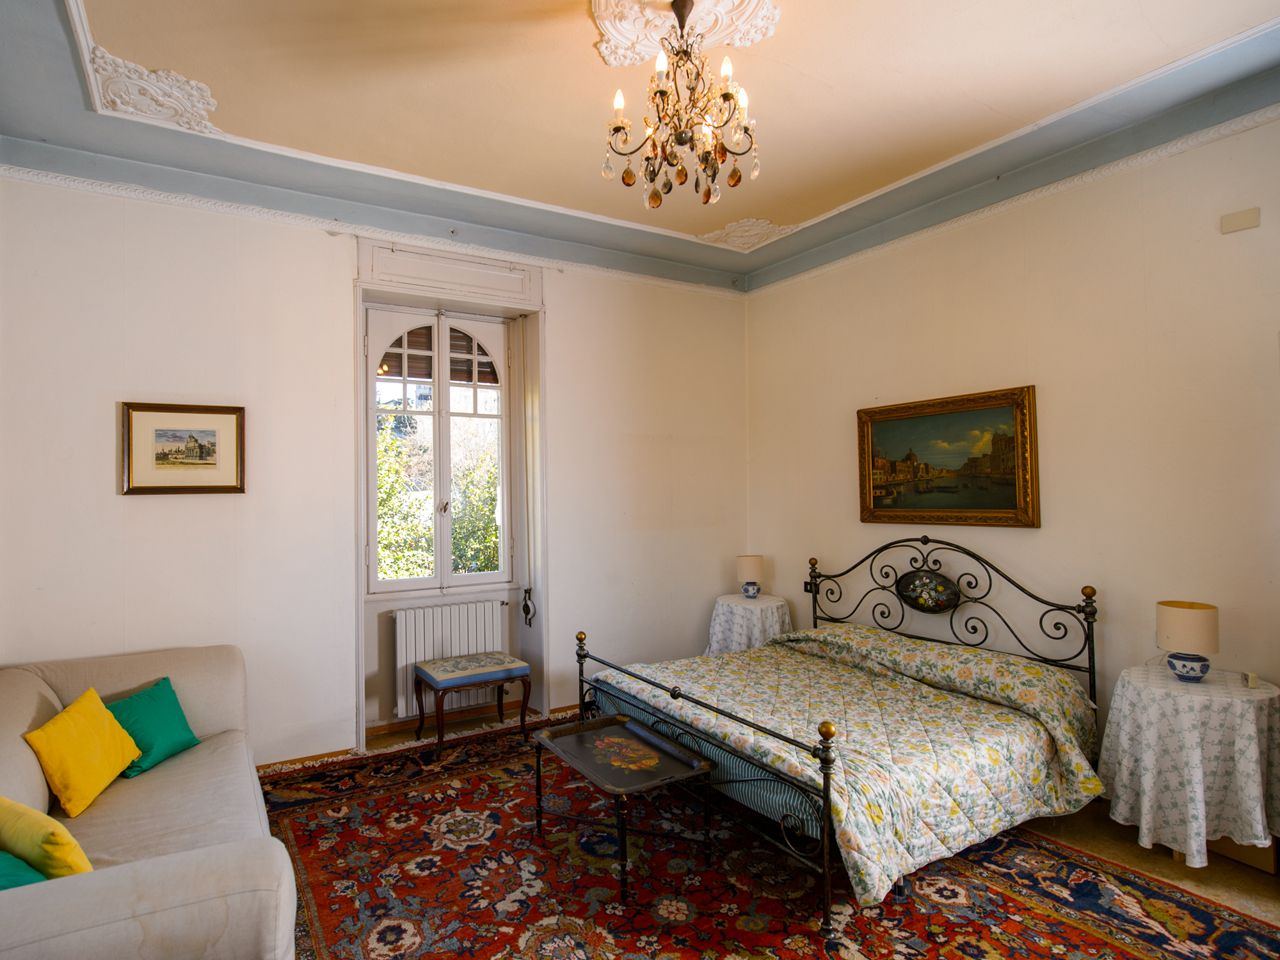 Verbania - Villa - Epoca - Camera matrimoniale